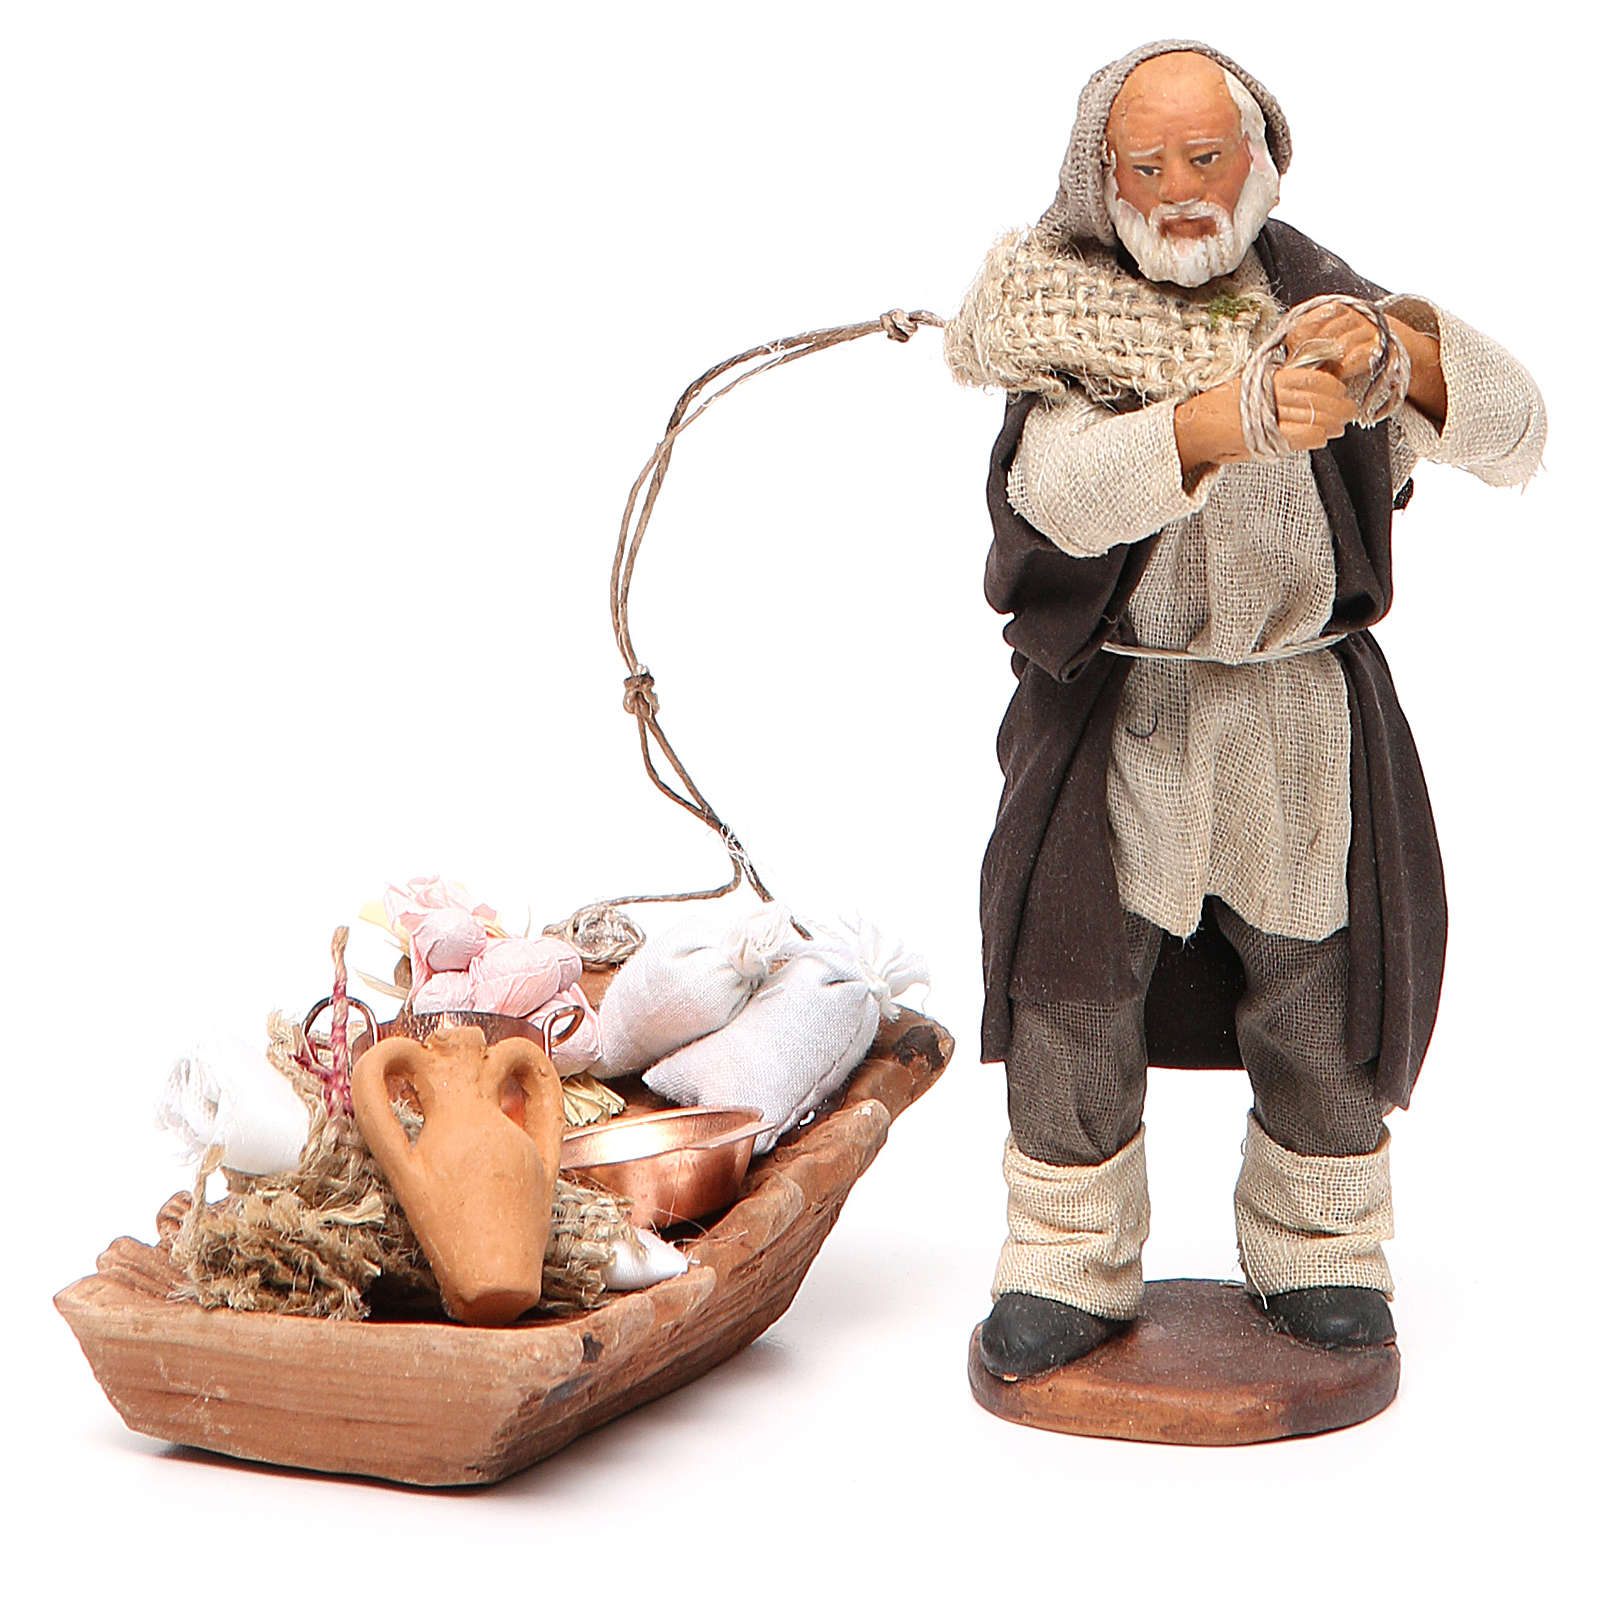 Soap seller, Neapolitan nativity figurine 12cm 4